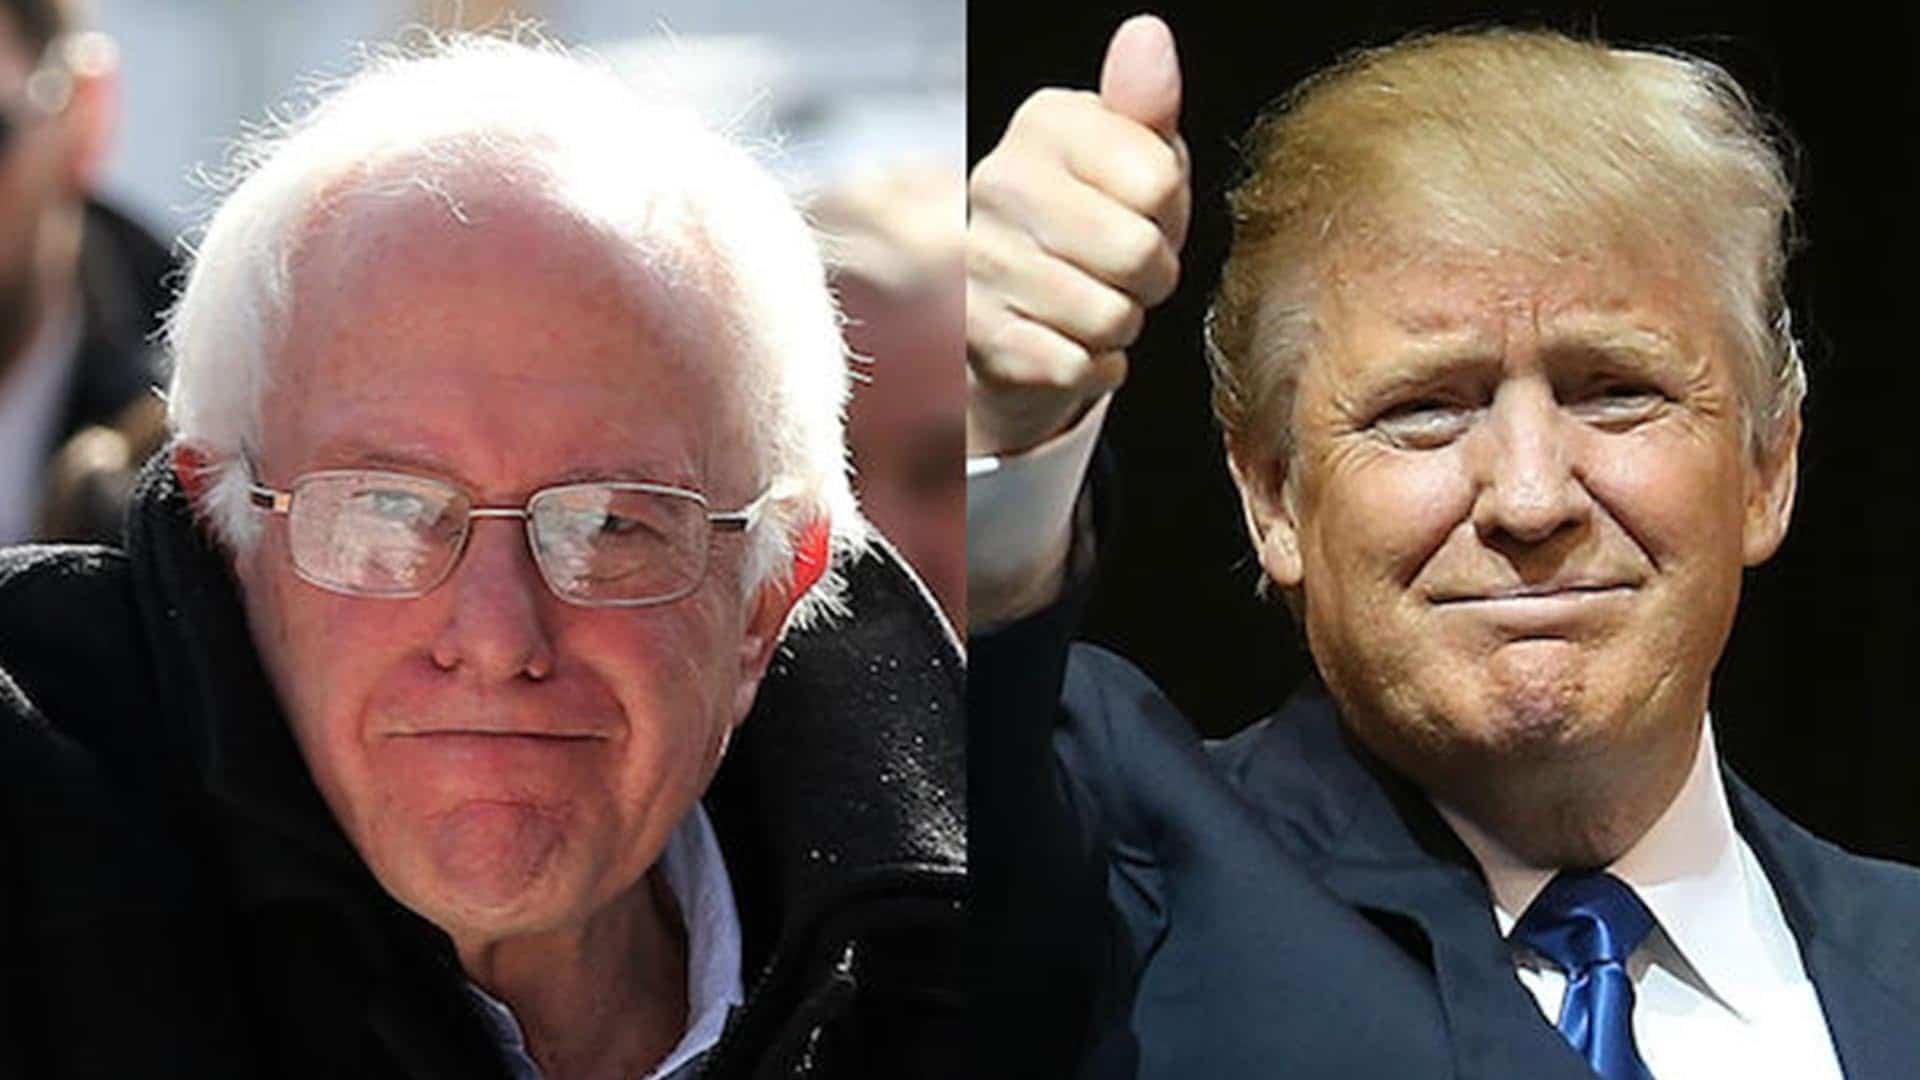 Monday- Trump, Sir Orange The Good To Meet Sanders, Sir Red The Bad?